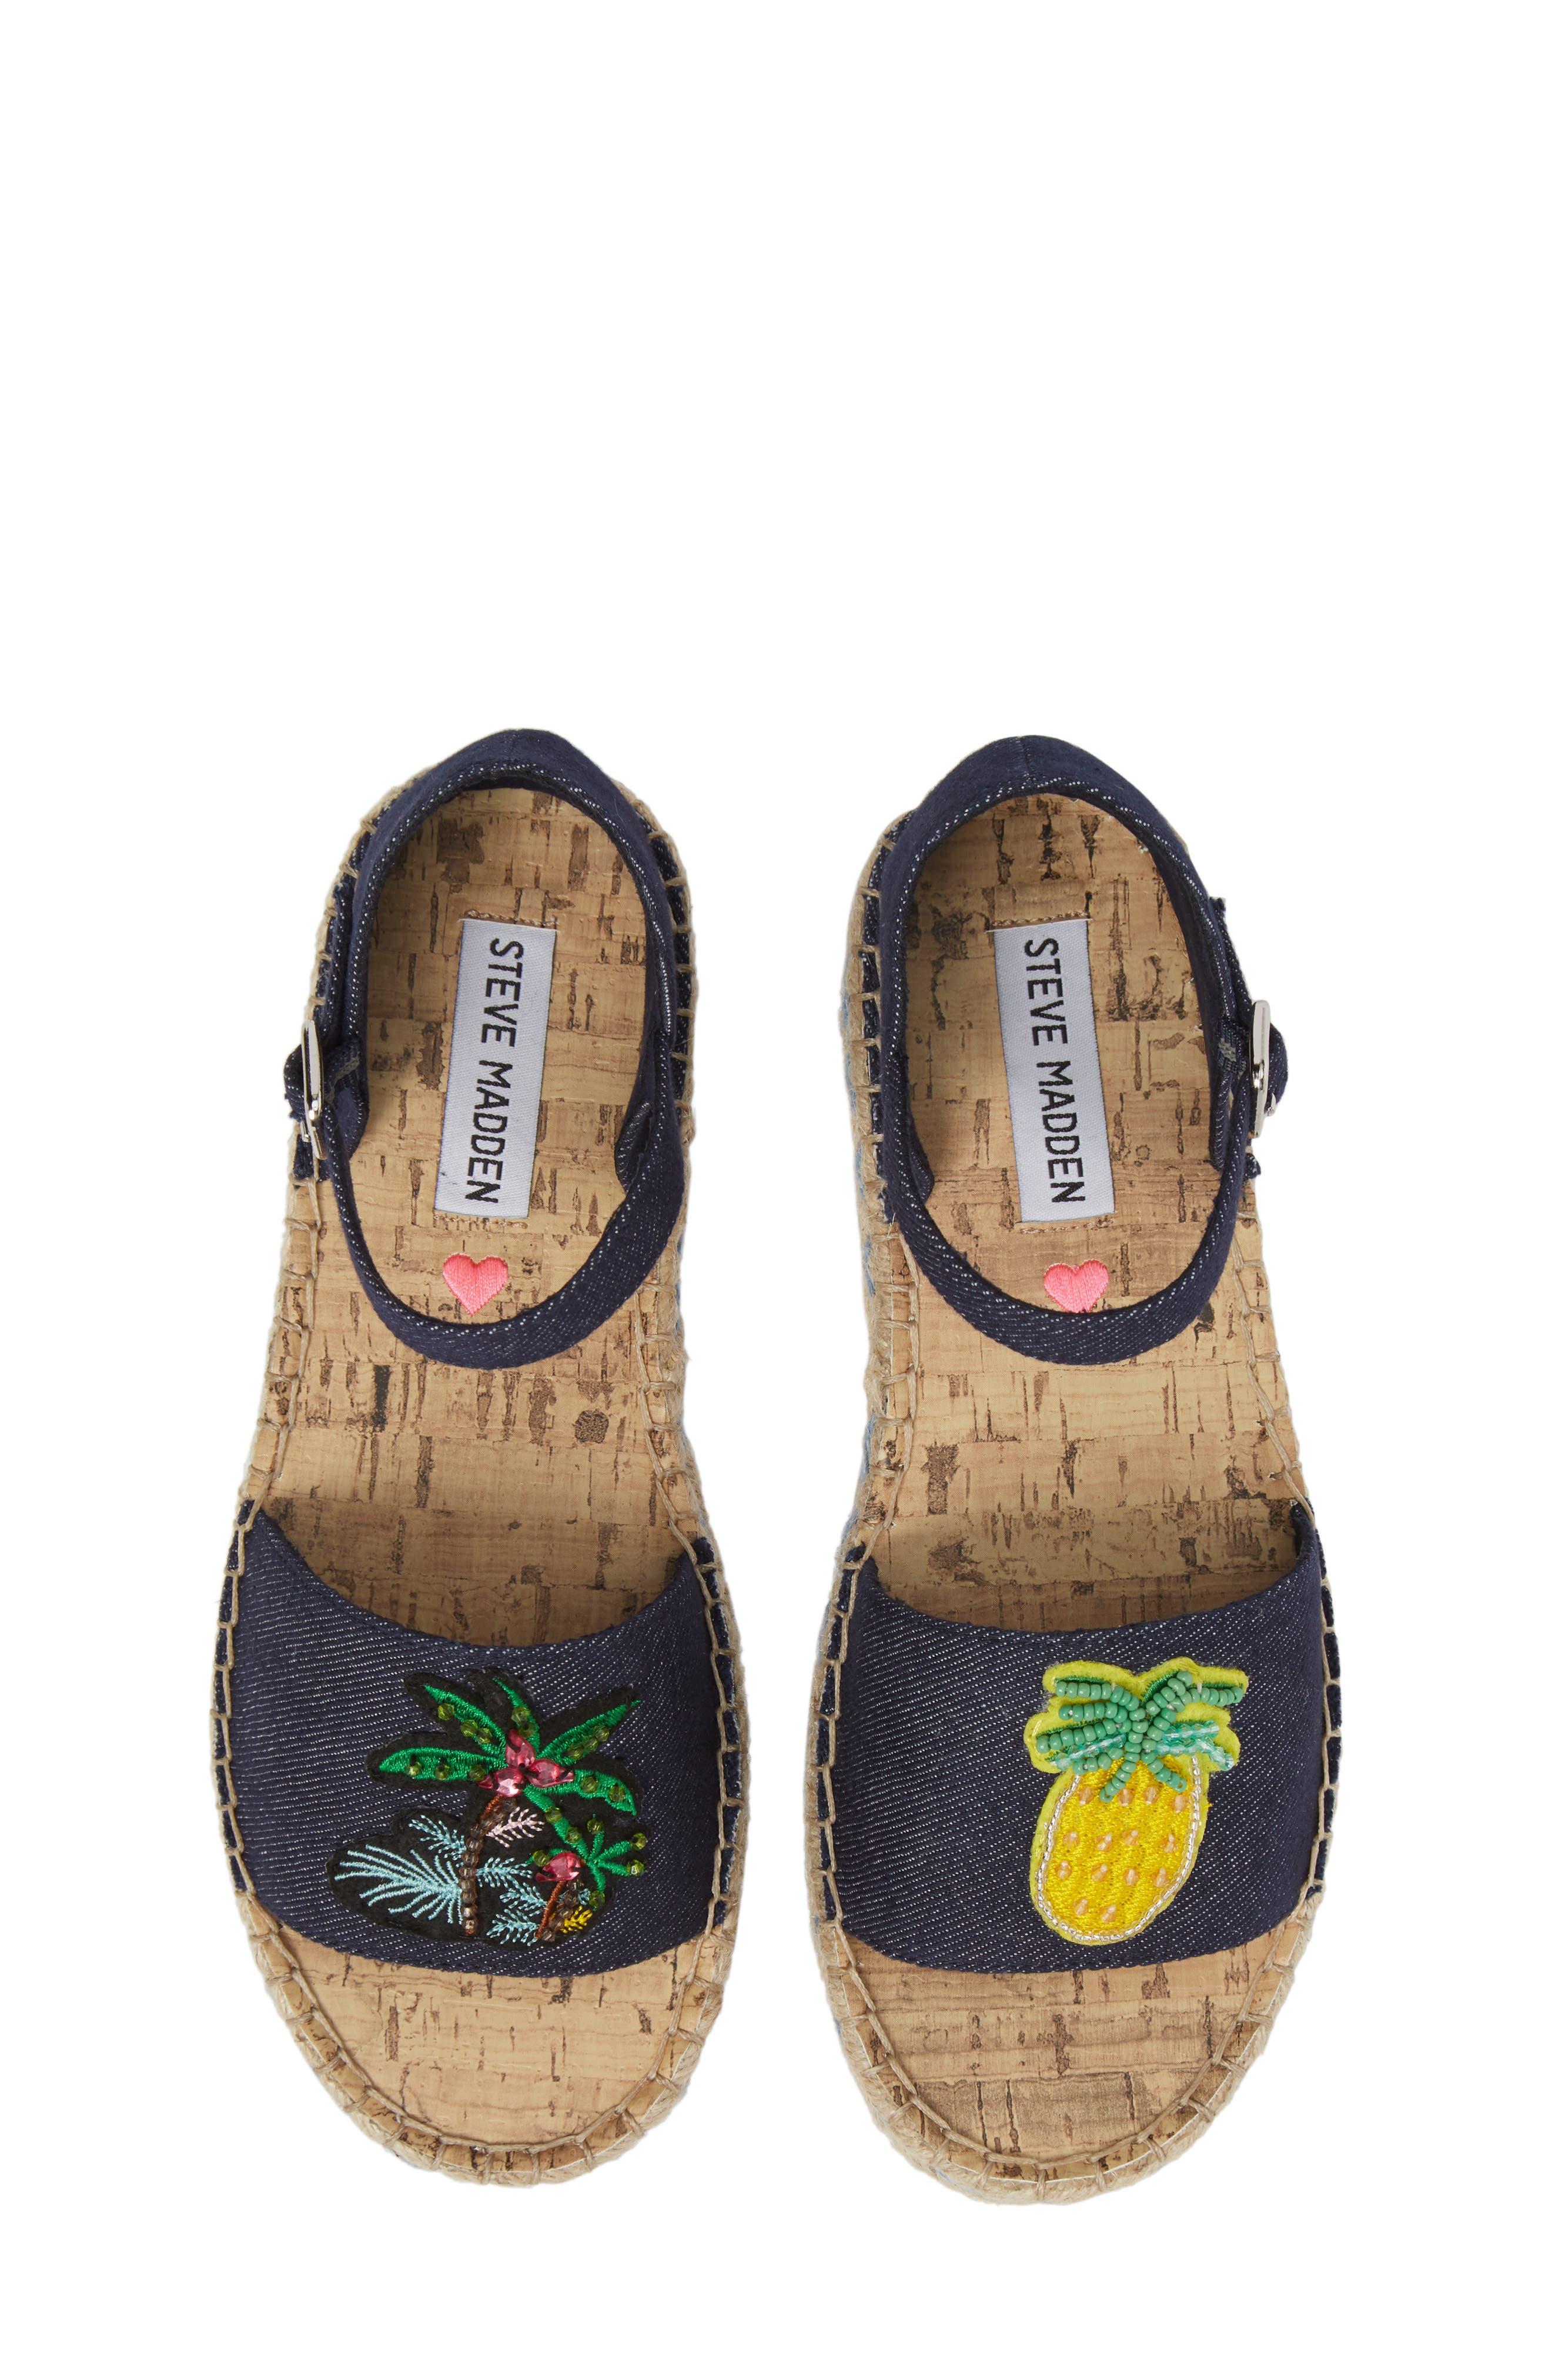 JLUAO Tropical Embellished Sandal,                             Main thumbnail 1, color,                             Fruit Multi